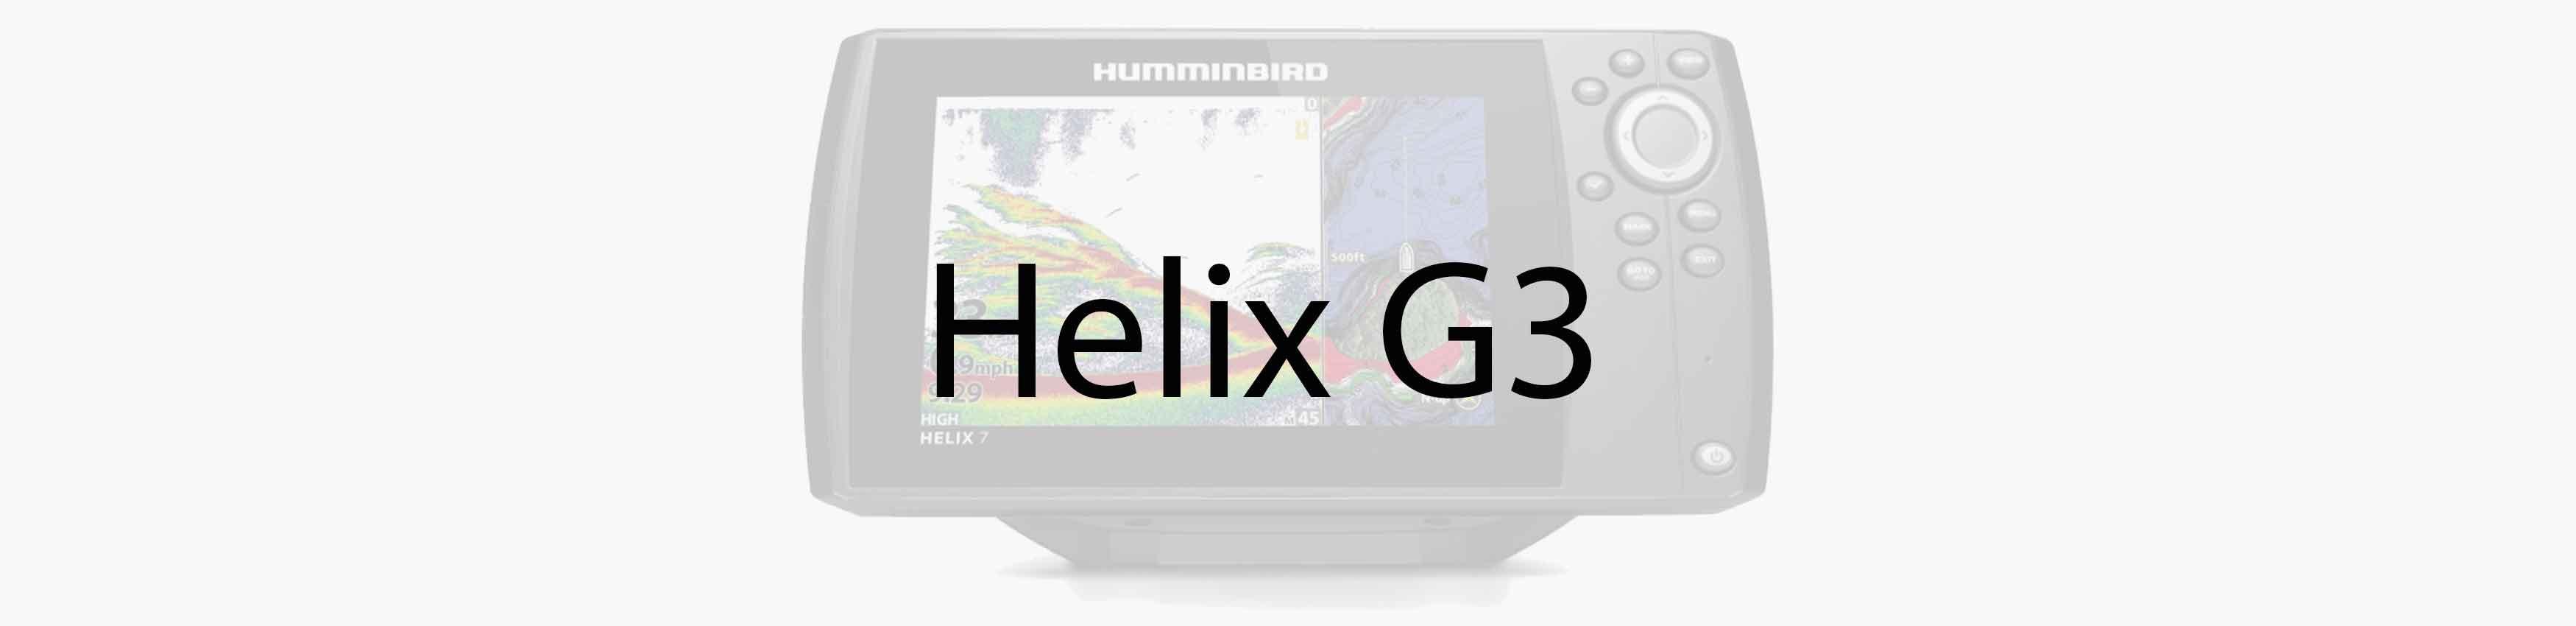 Helix G3